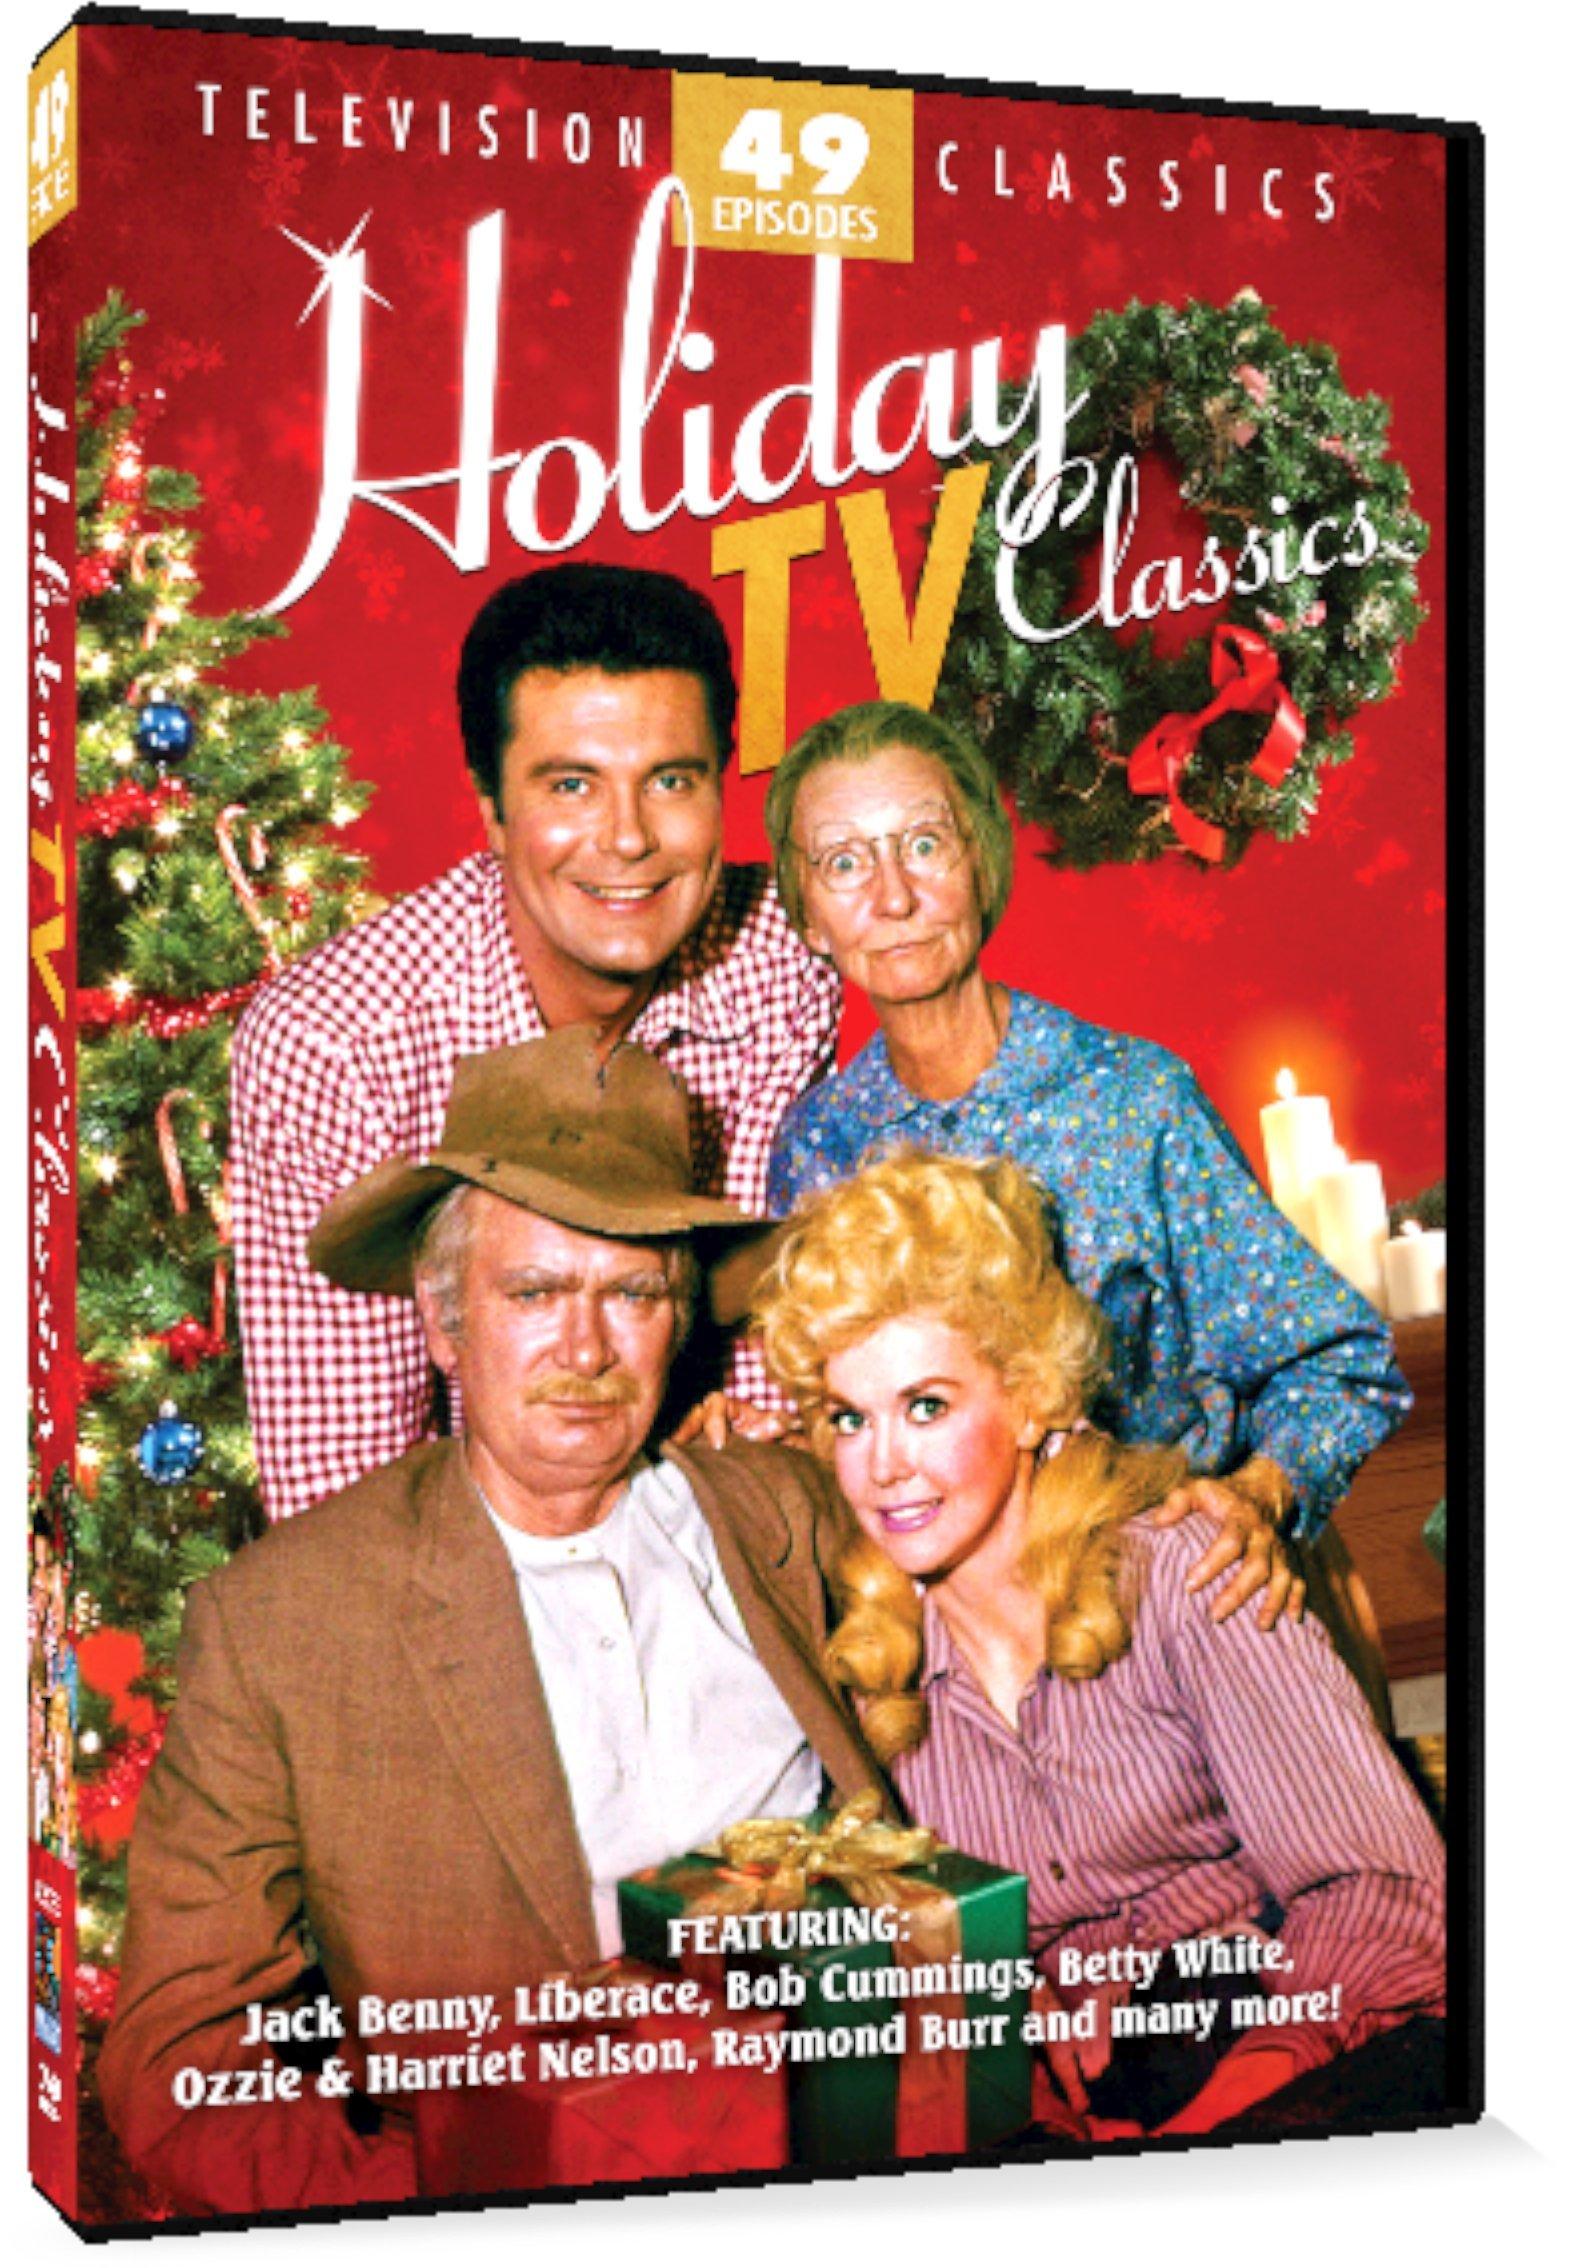 Holiday TV Classics: 49 TV Classic Episodes